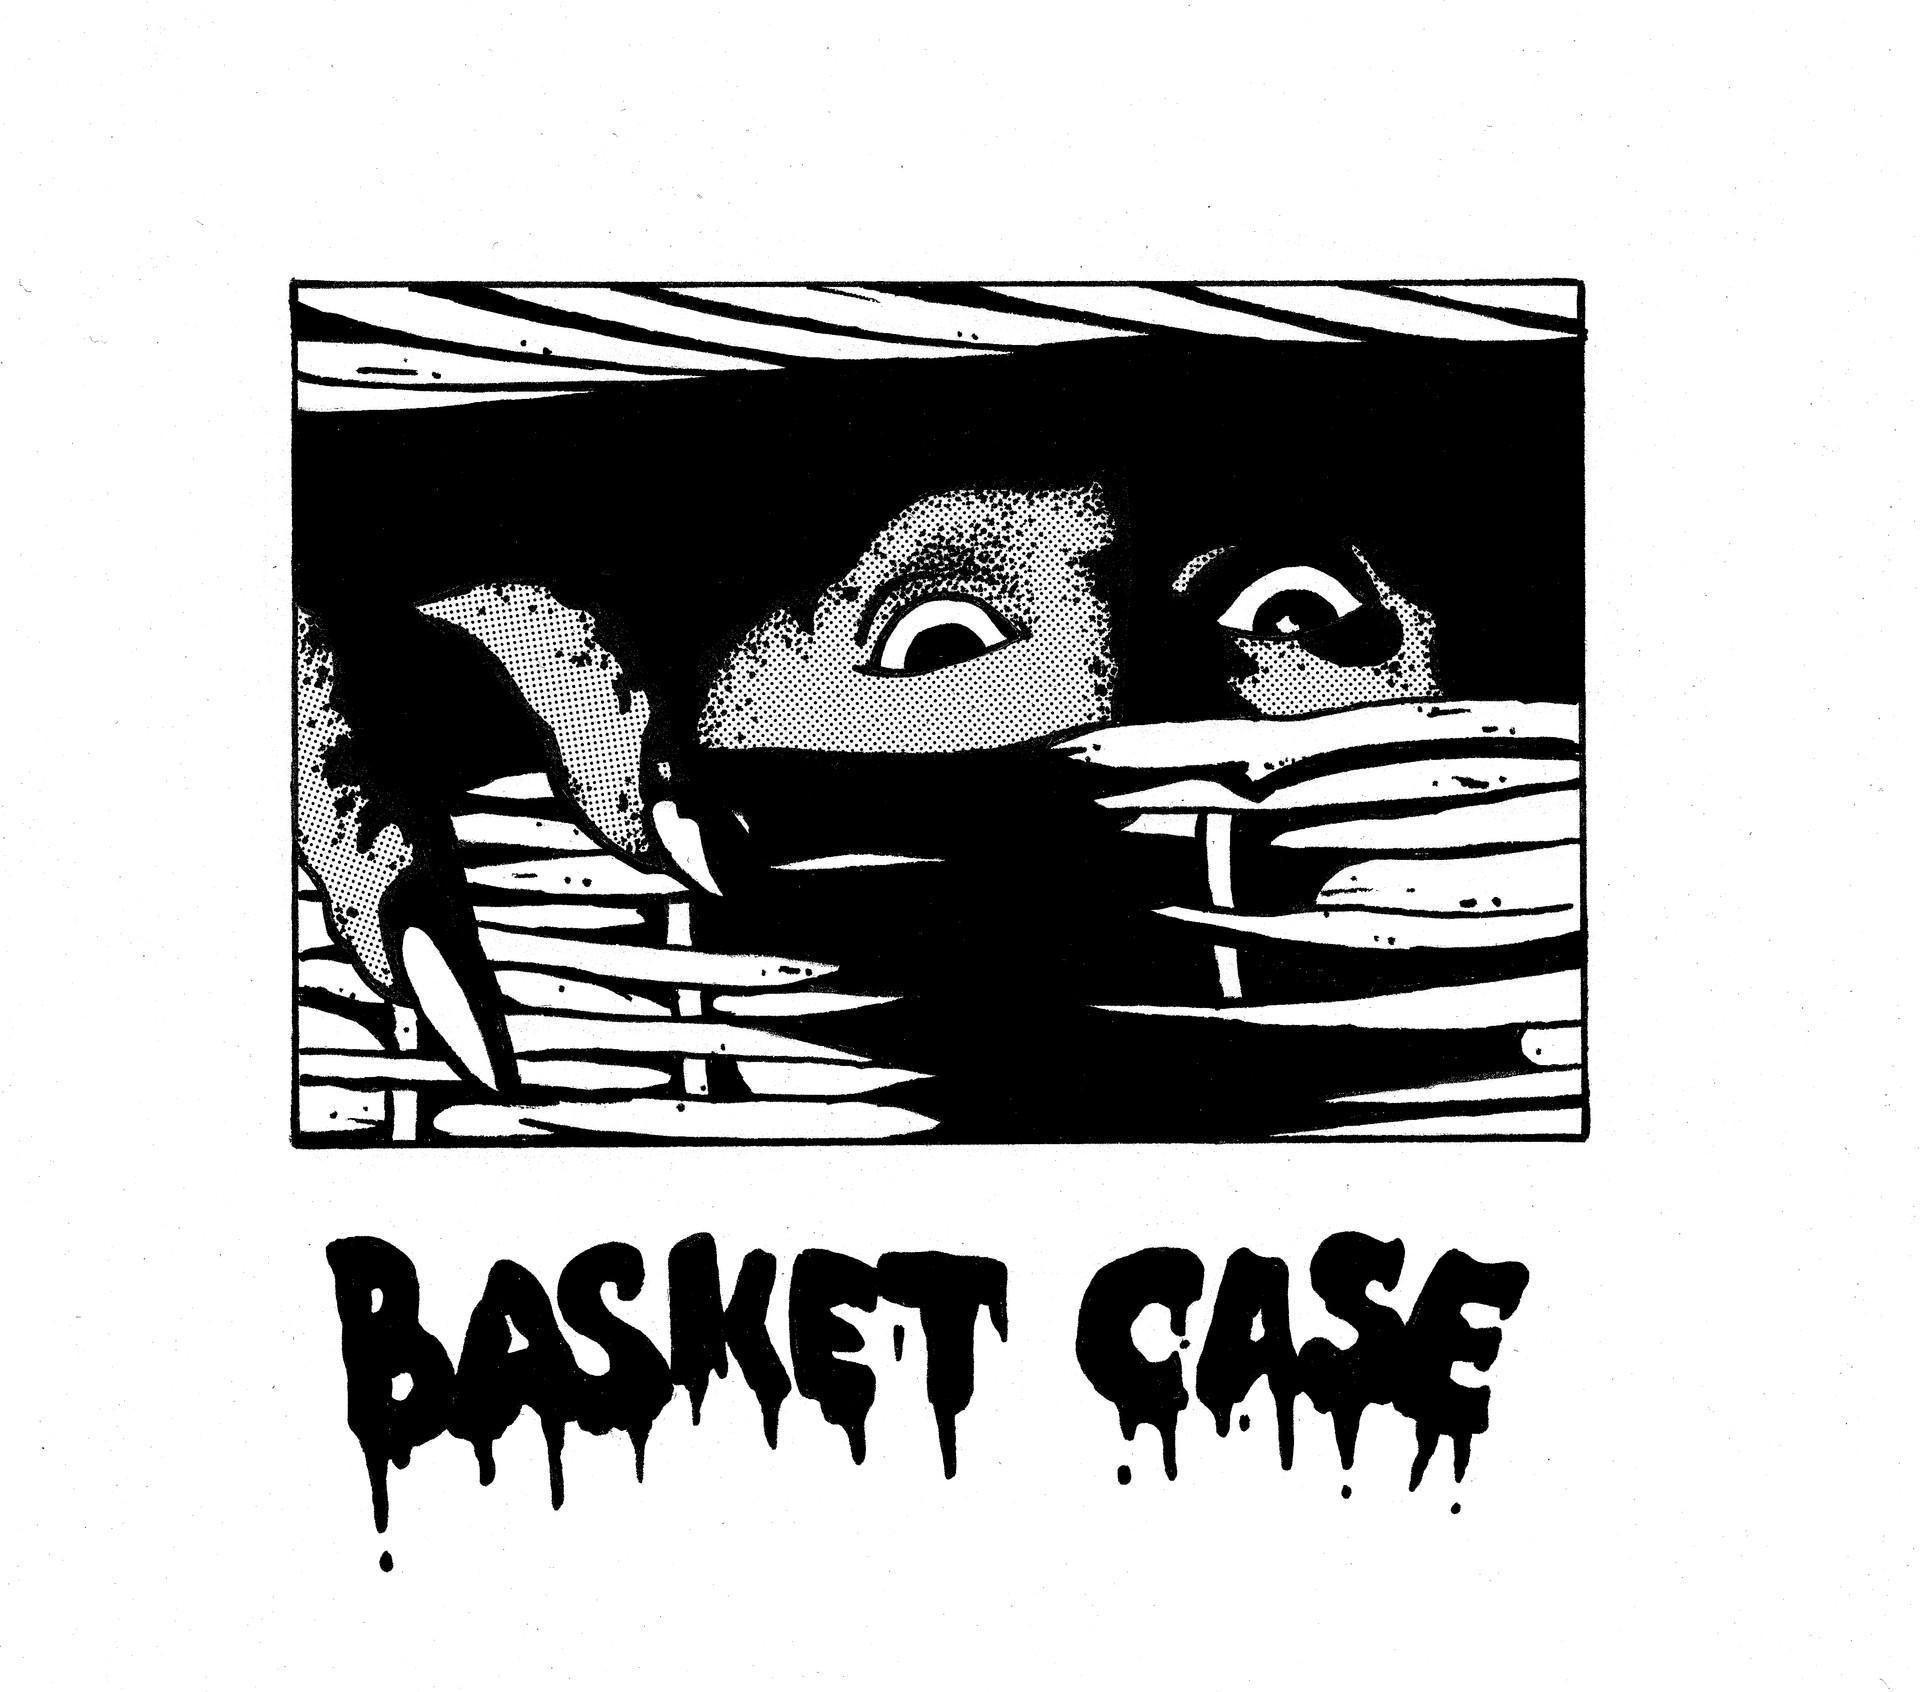 Basket Case.jpg